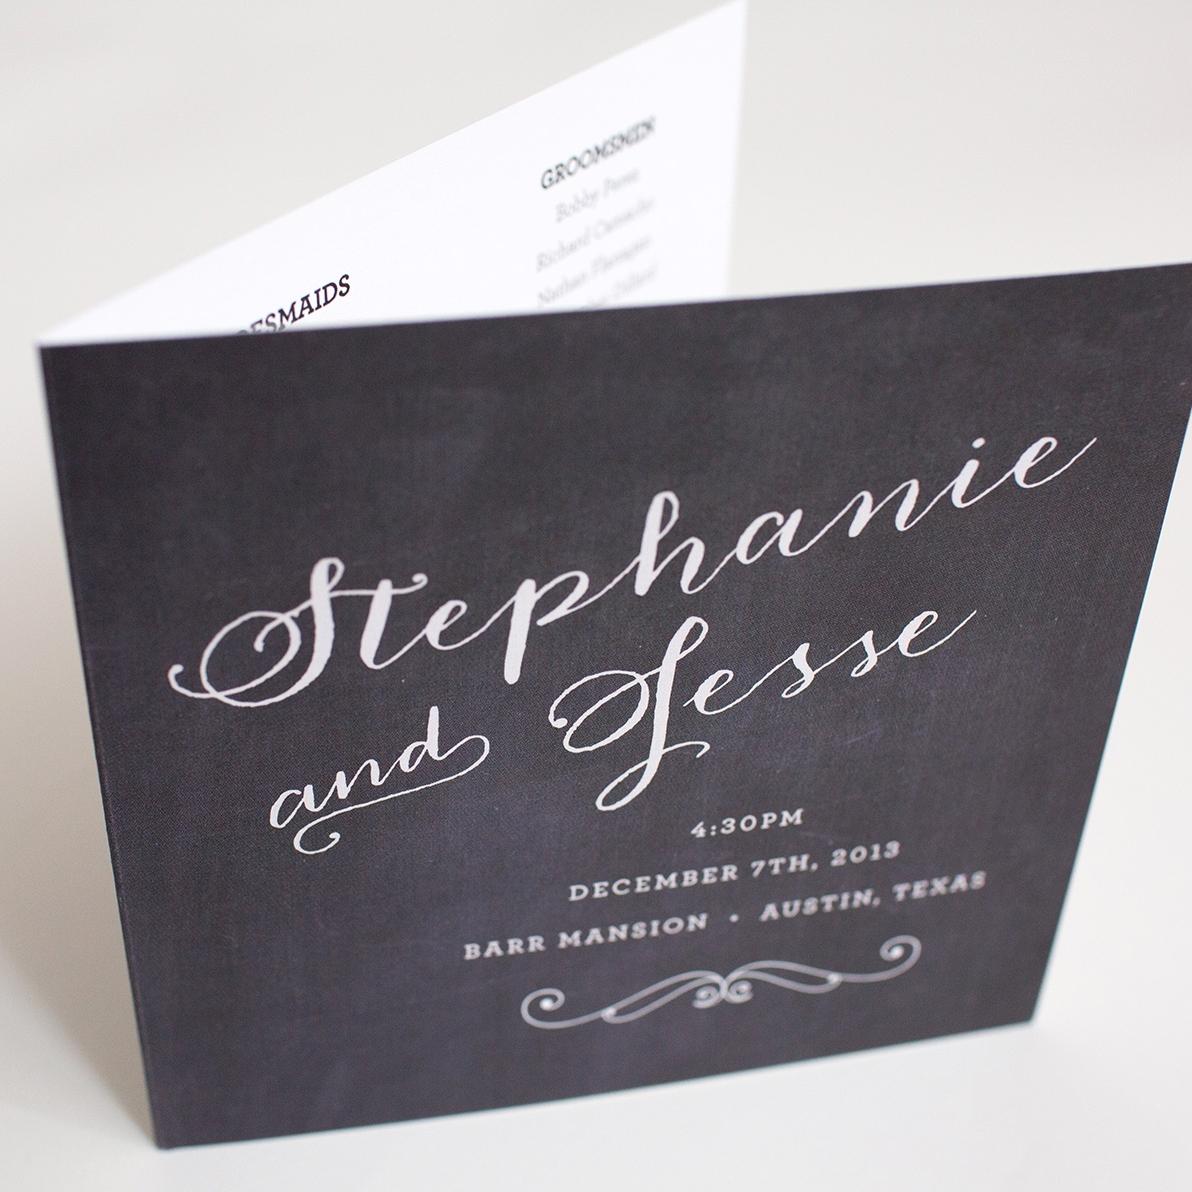 Stephanie-09.jpg